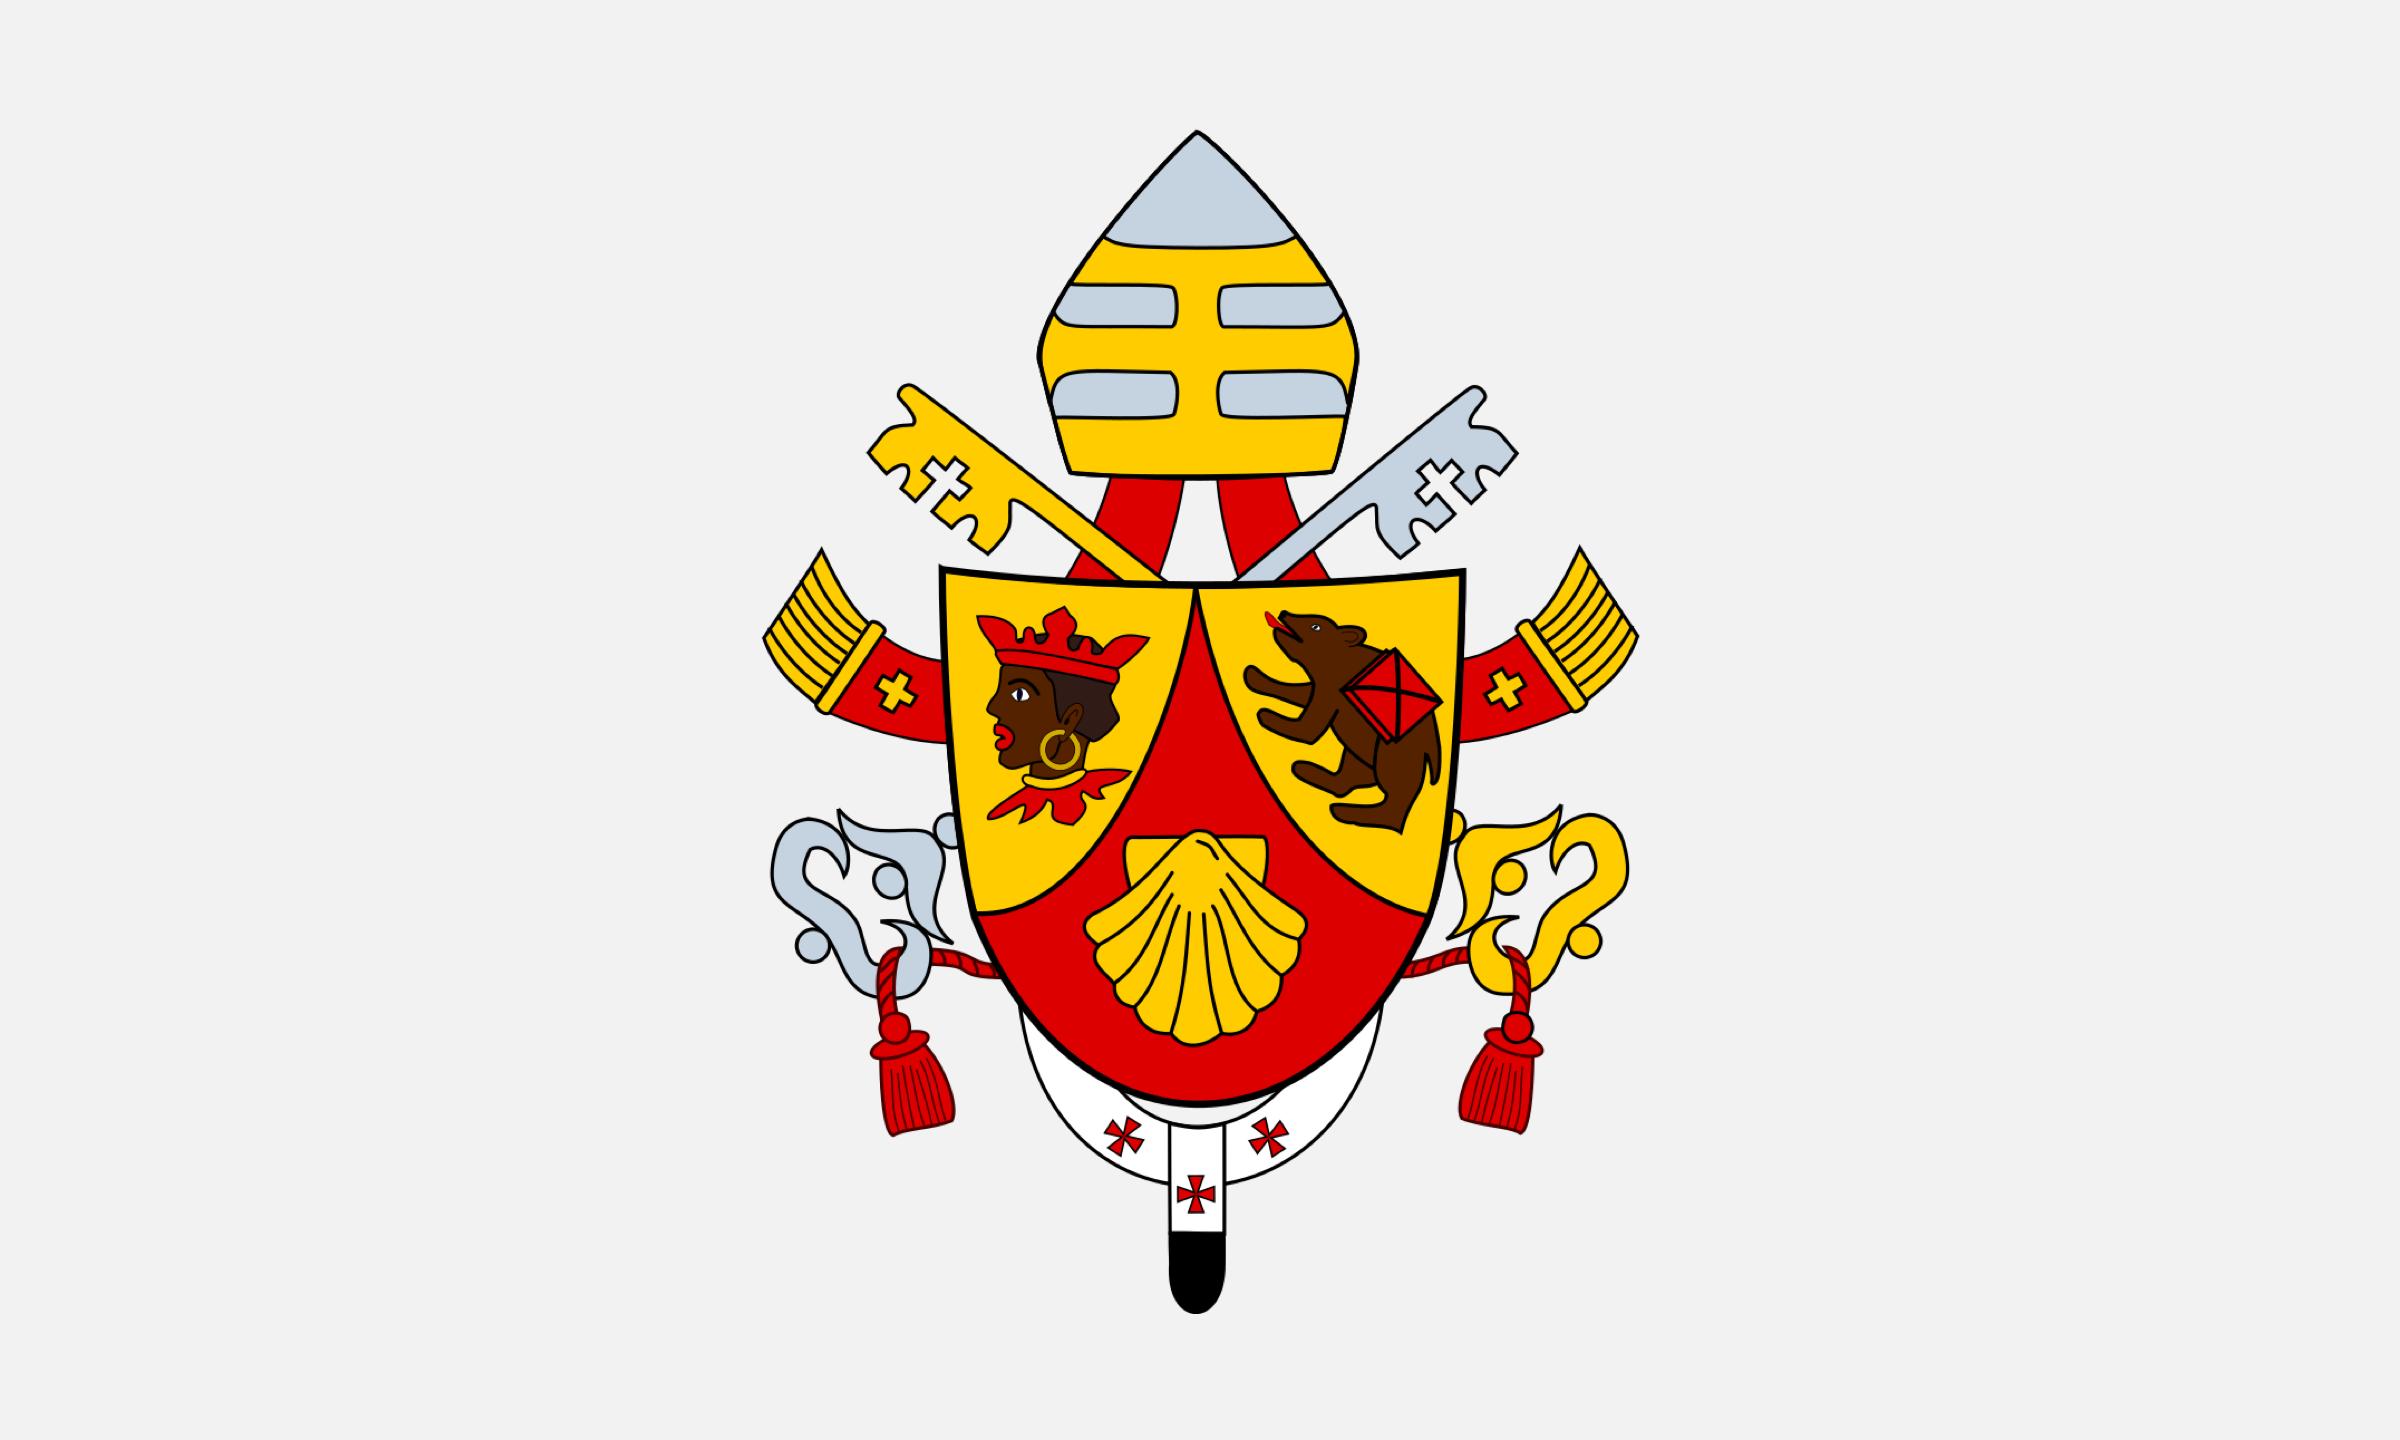 2019 Papst Benedikt Xvi Wappen